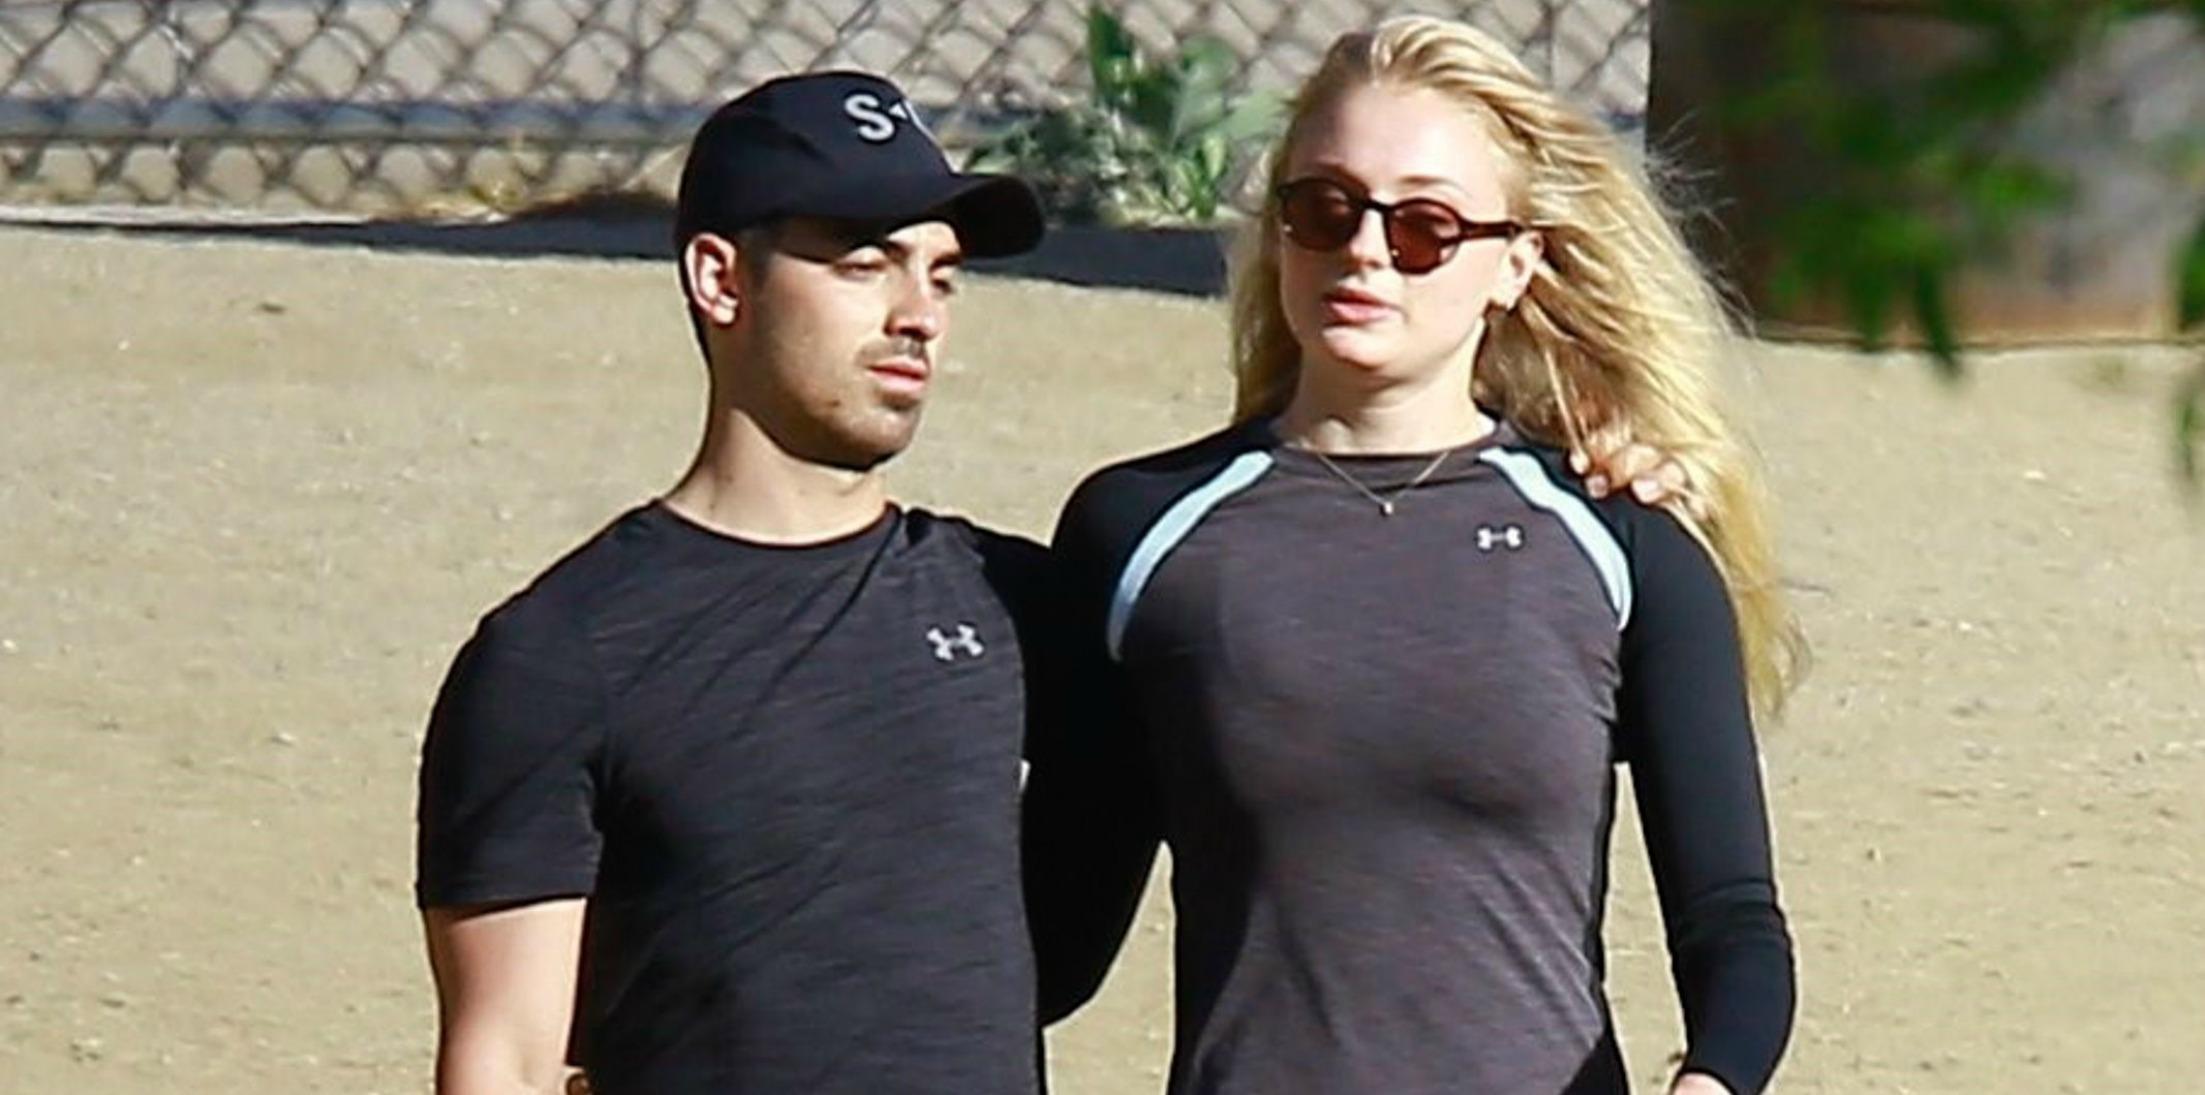 Joe jonas dating sophia turner workout together h